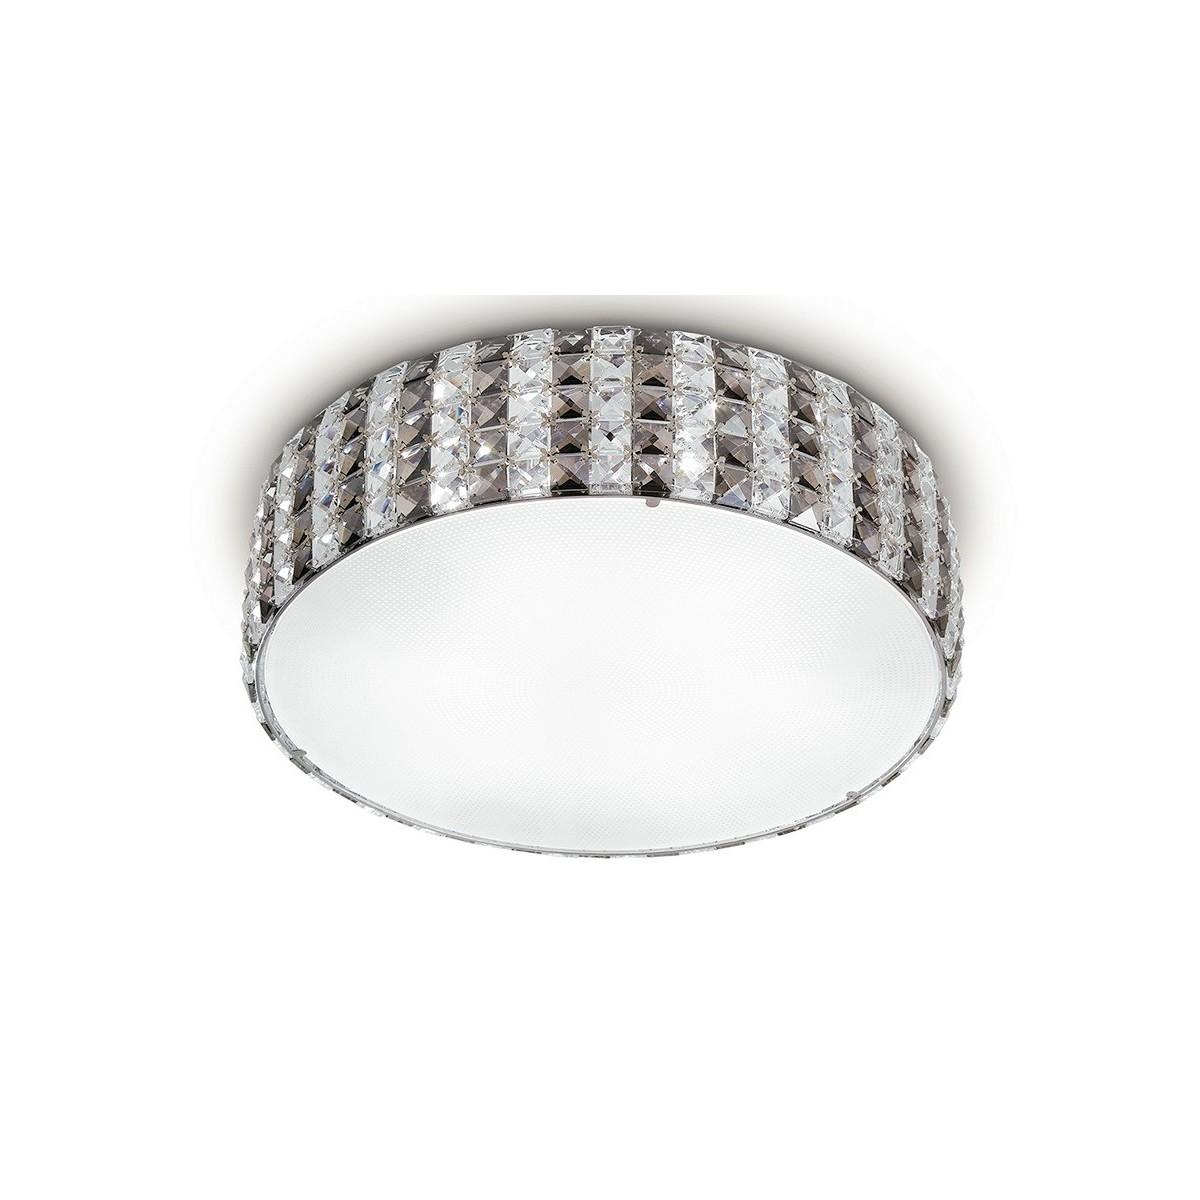 I-TANGO/PL45 - Plafoniera Tonda diffusore Vetro Cristalli K9 Lampada Soffitto Moderna G9